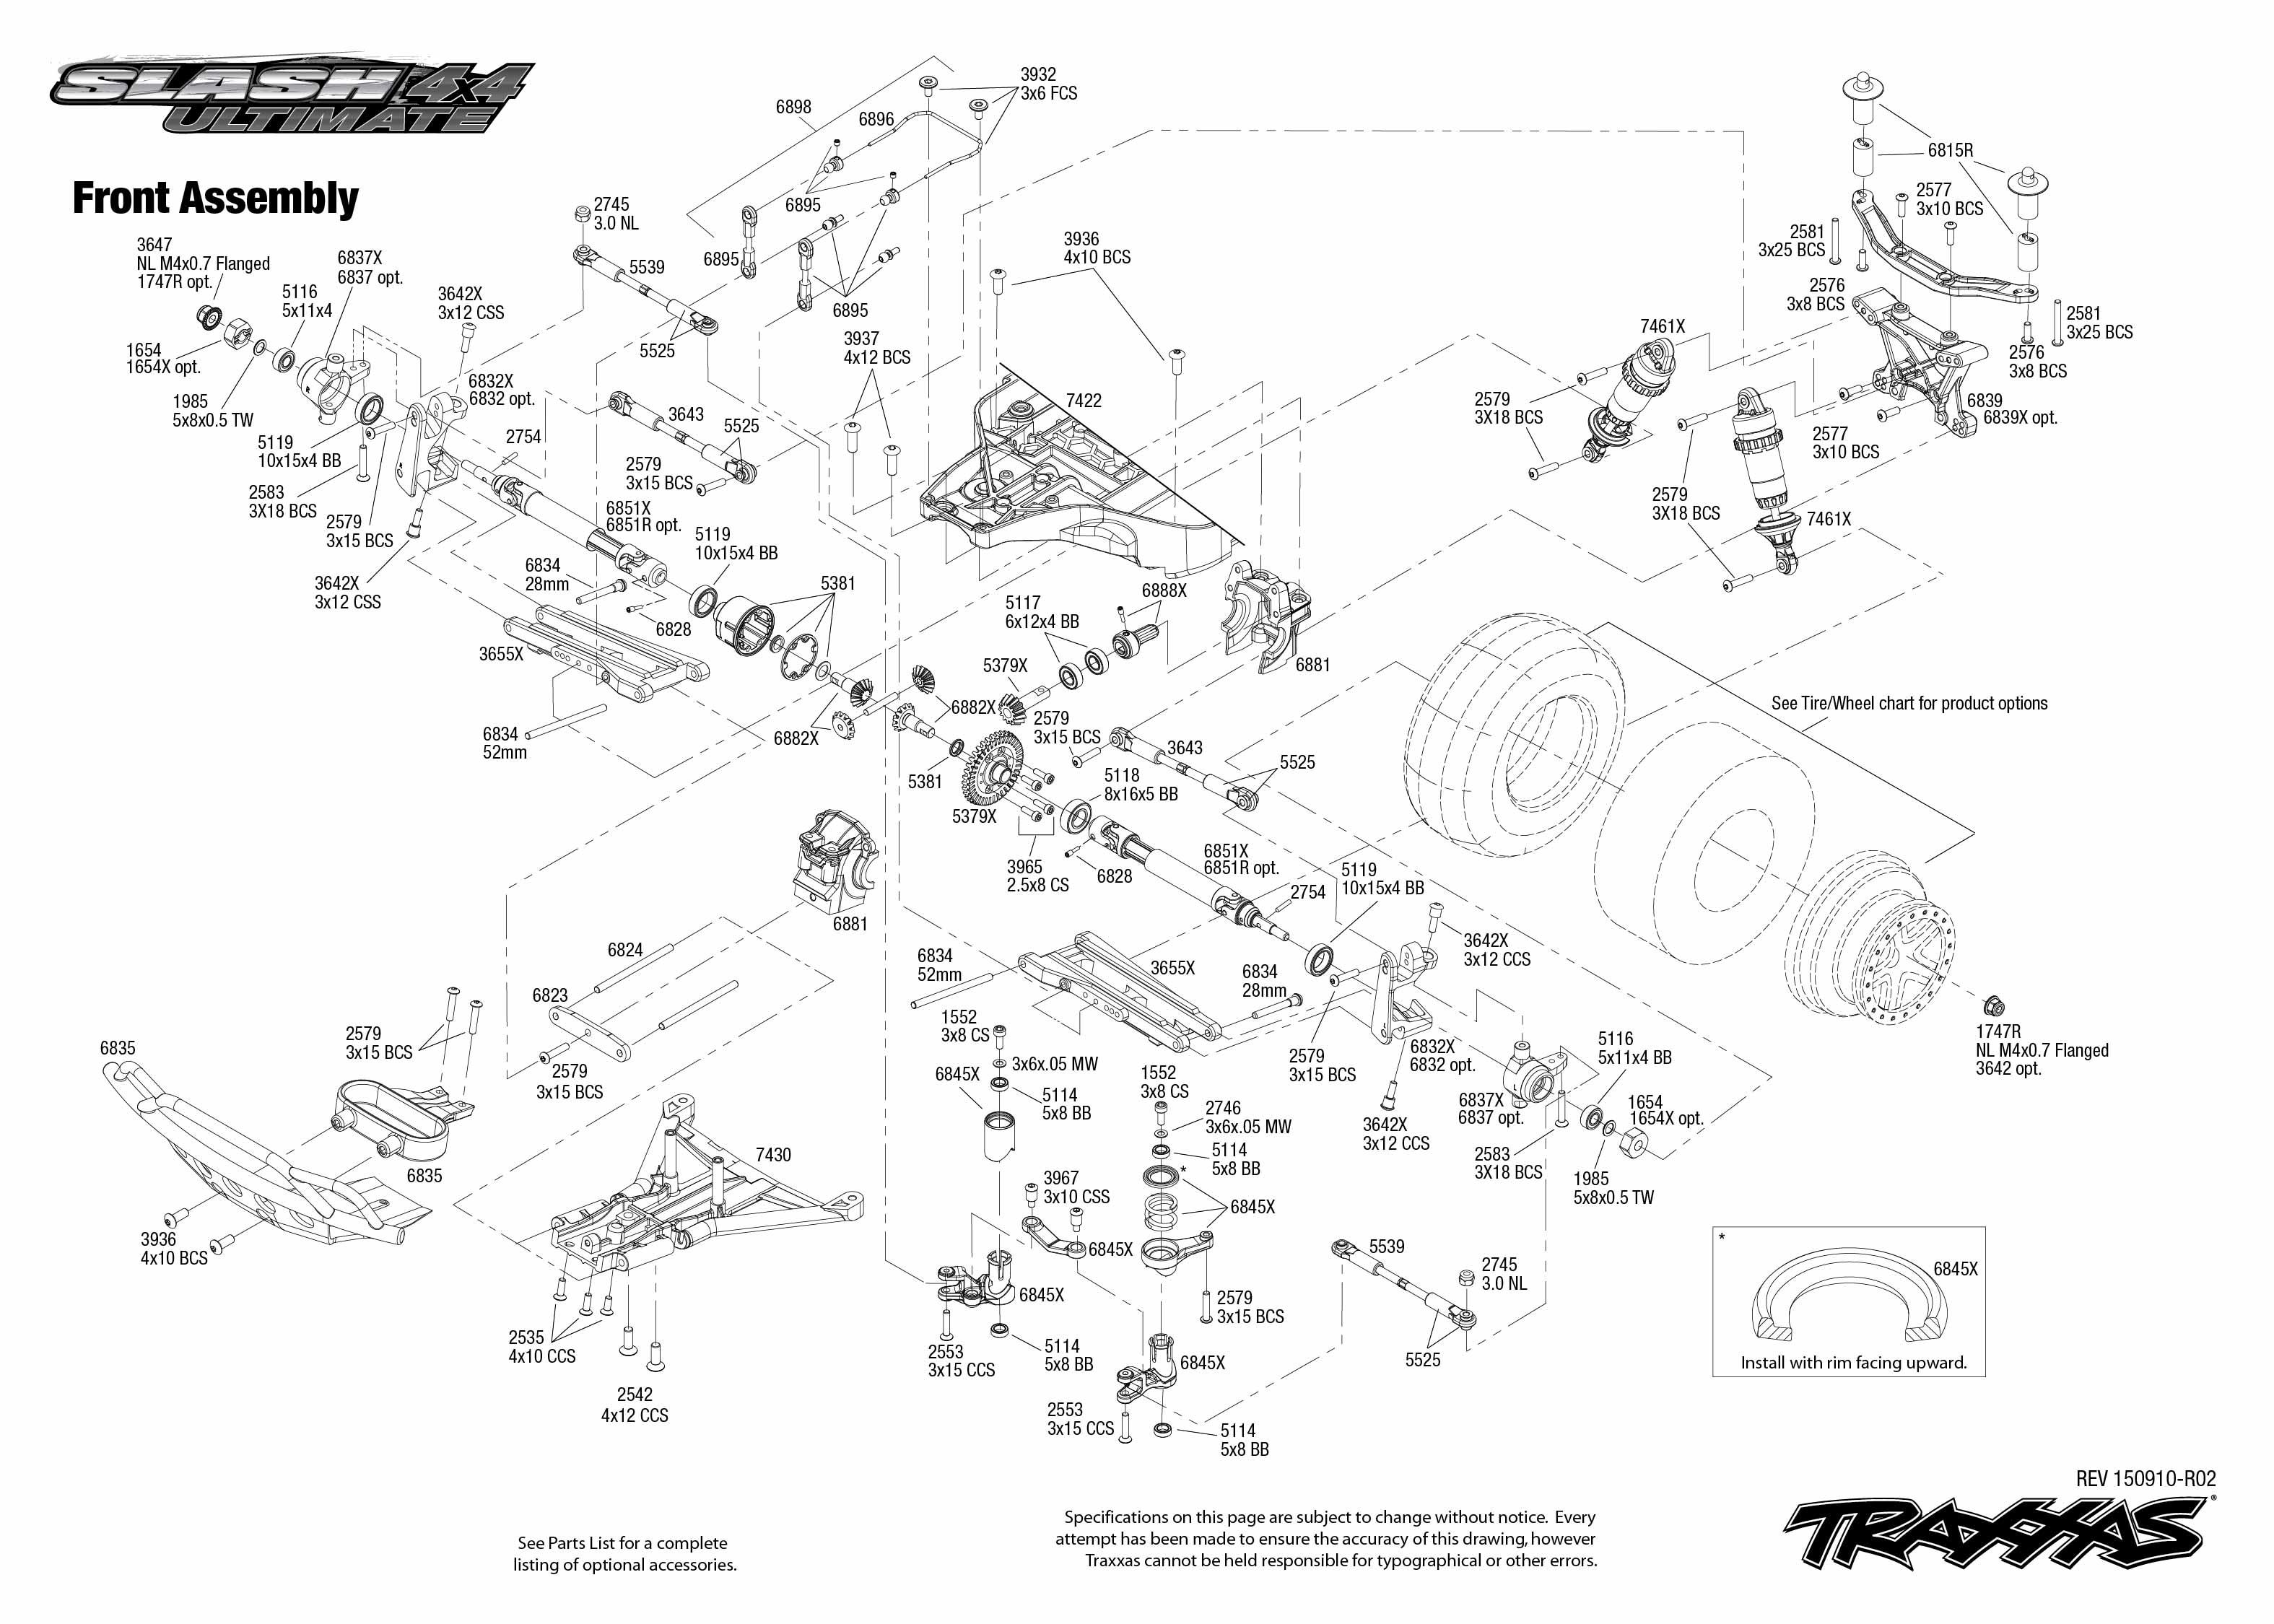 traxxas traxxas slash 4x4 ultimate rtr  lcg chassis  mit